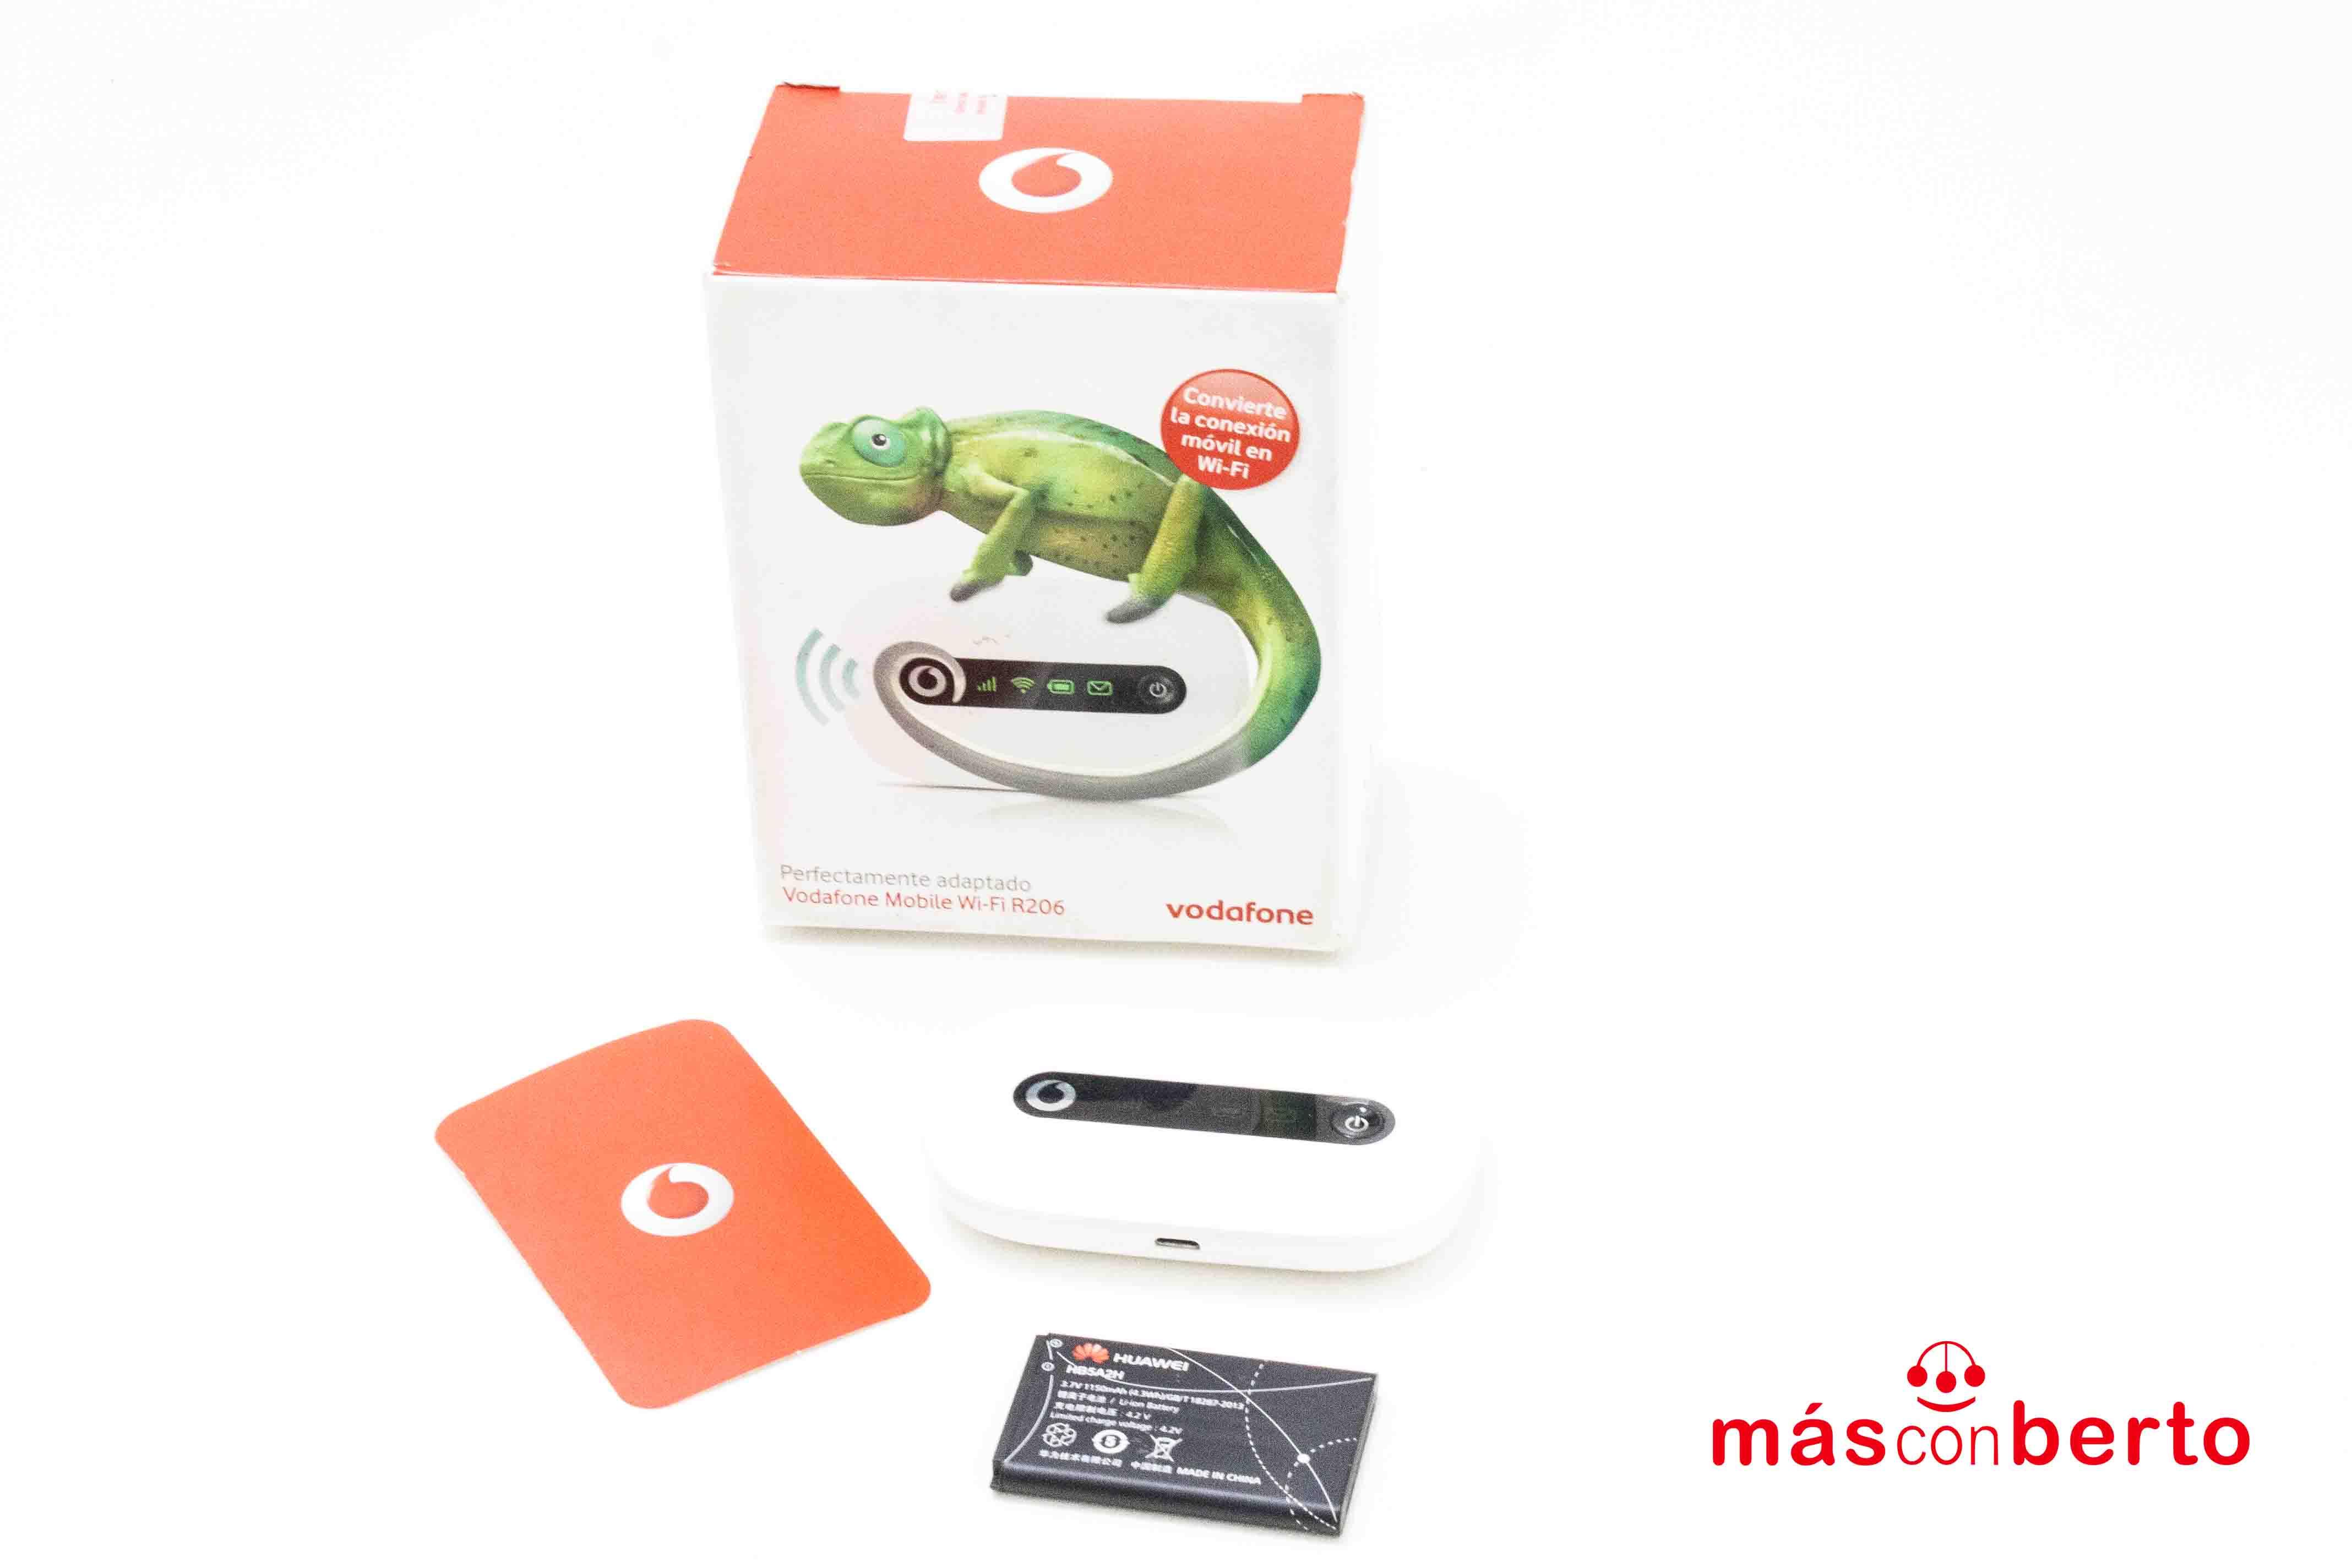 Router wifi R206 de vodafone